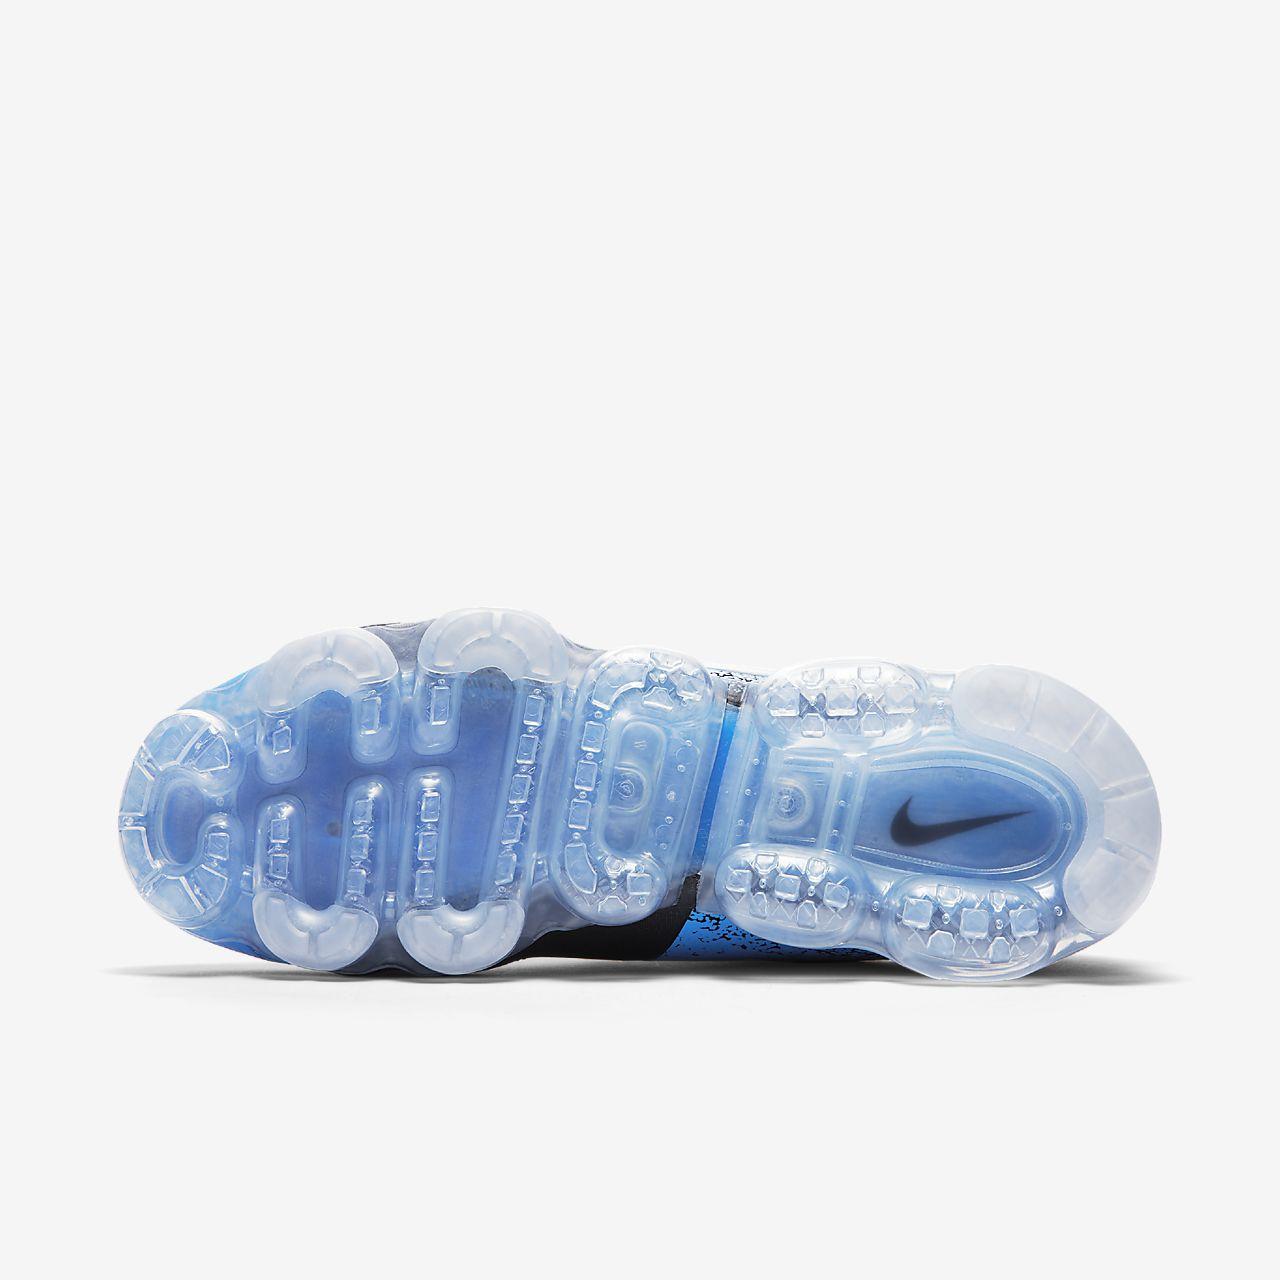 new products 6c4ba 07319 ... Nike Air VaporMax Men s Shoe